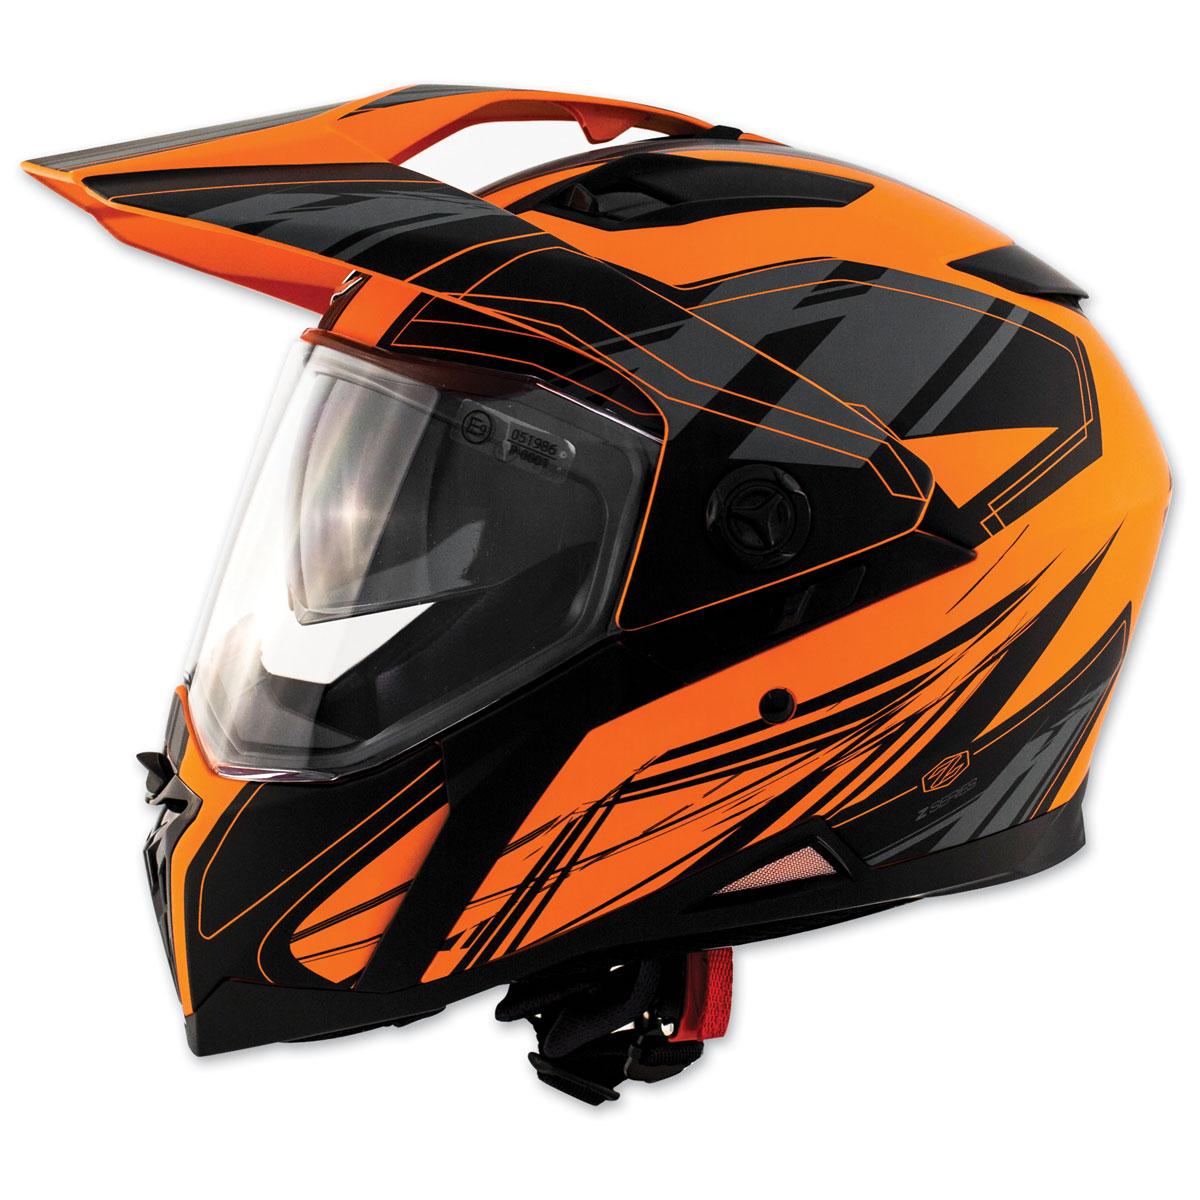 Zox Z-Series Z-DS10 Urbanite Matte Orange Dual Sport Helmet